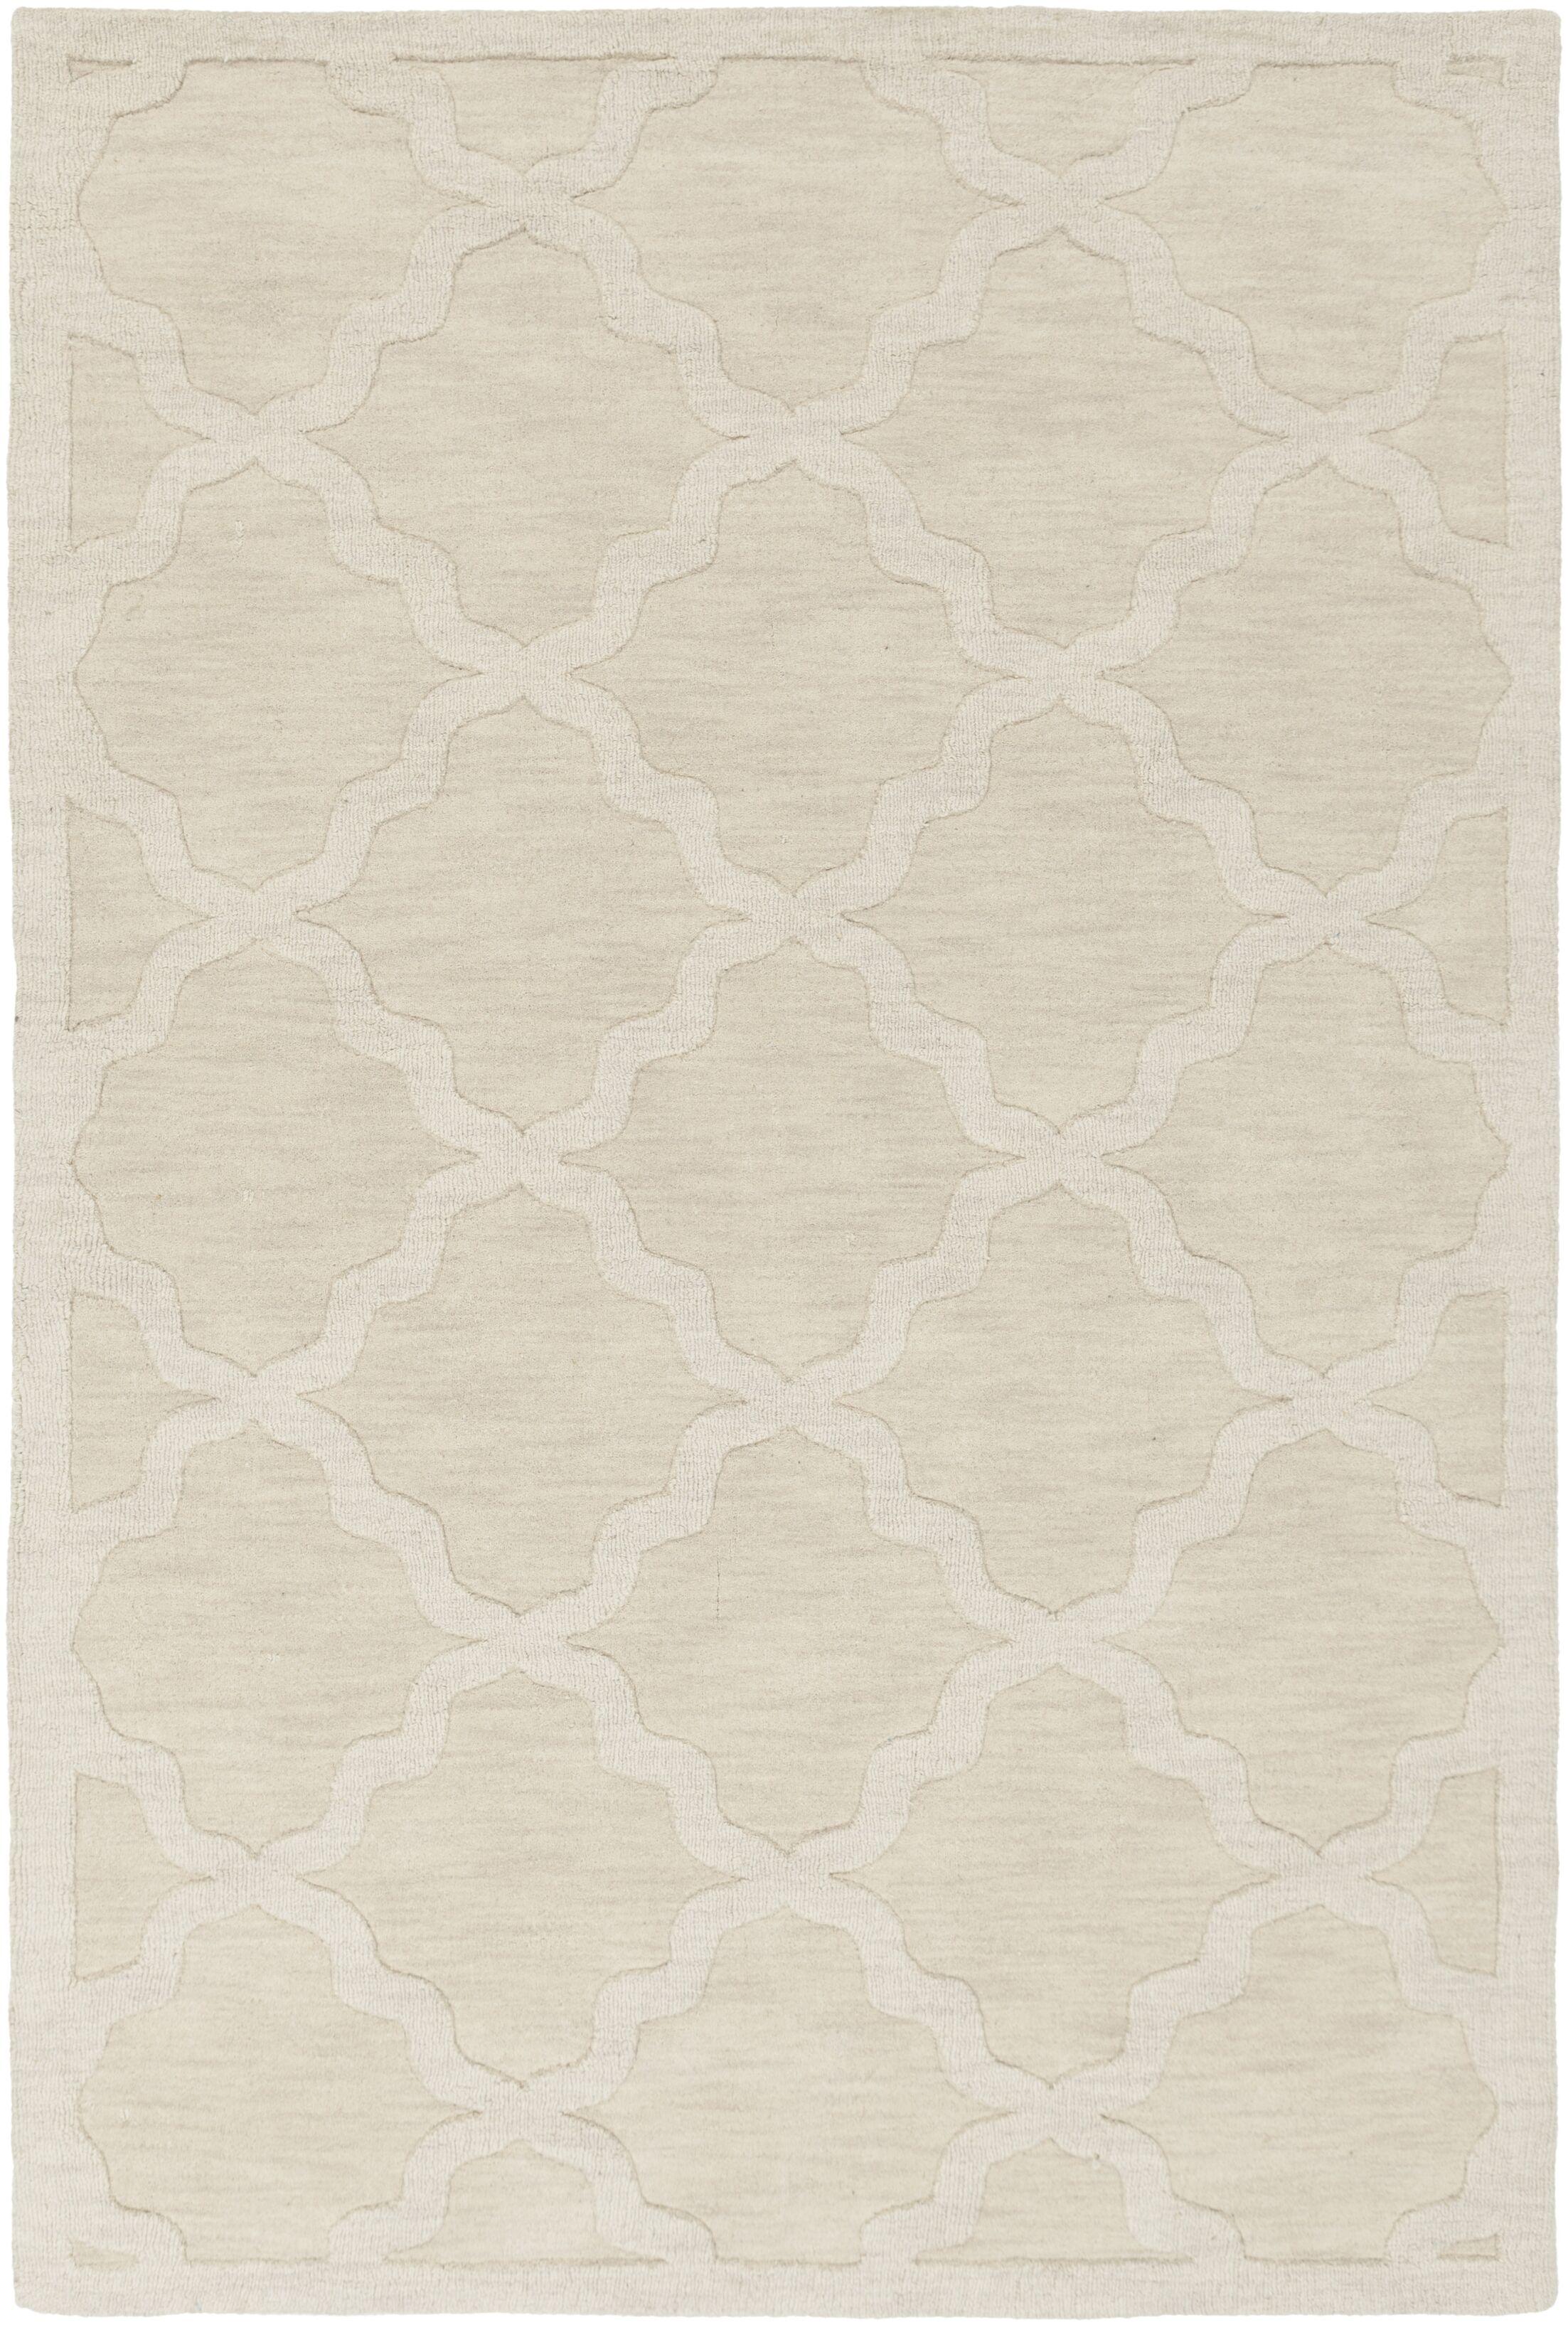 Blankenship Hand-Woven Wool Beige Area Rug Rug Size: Rectangle 6' x 9'